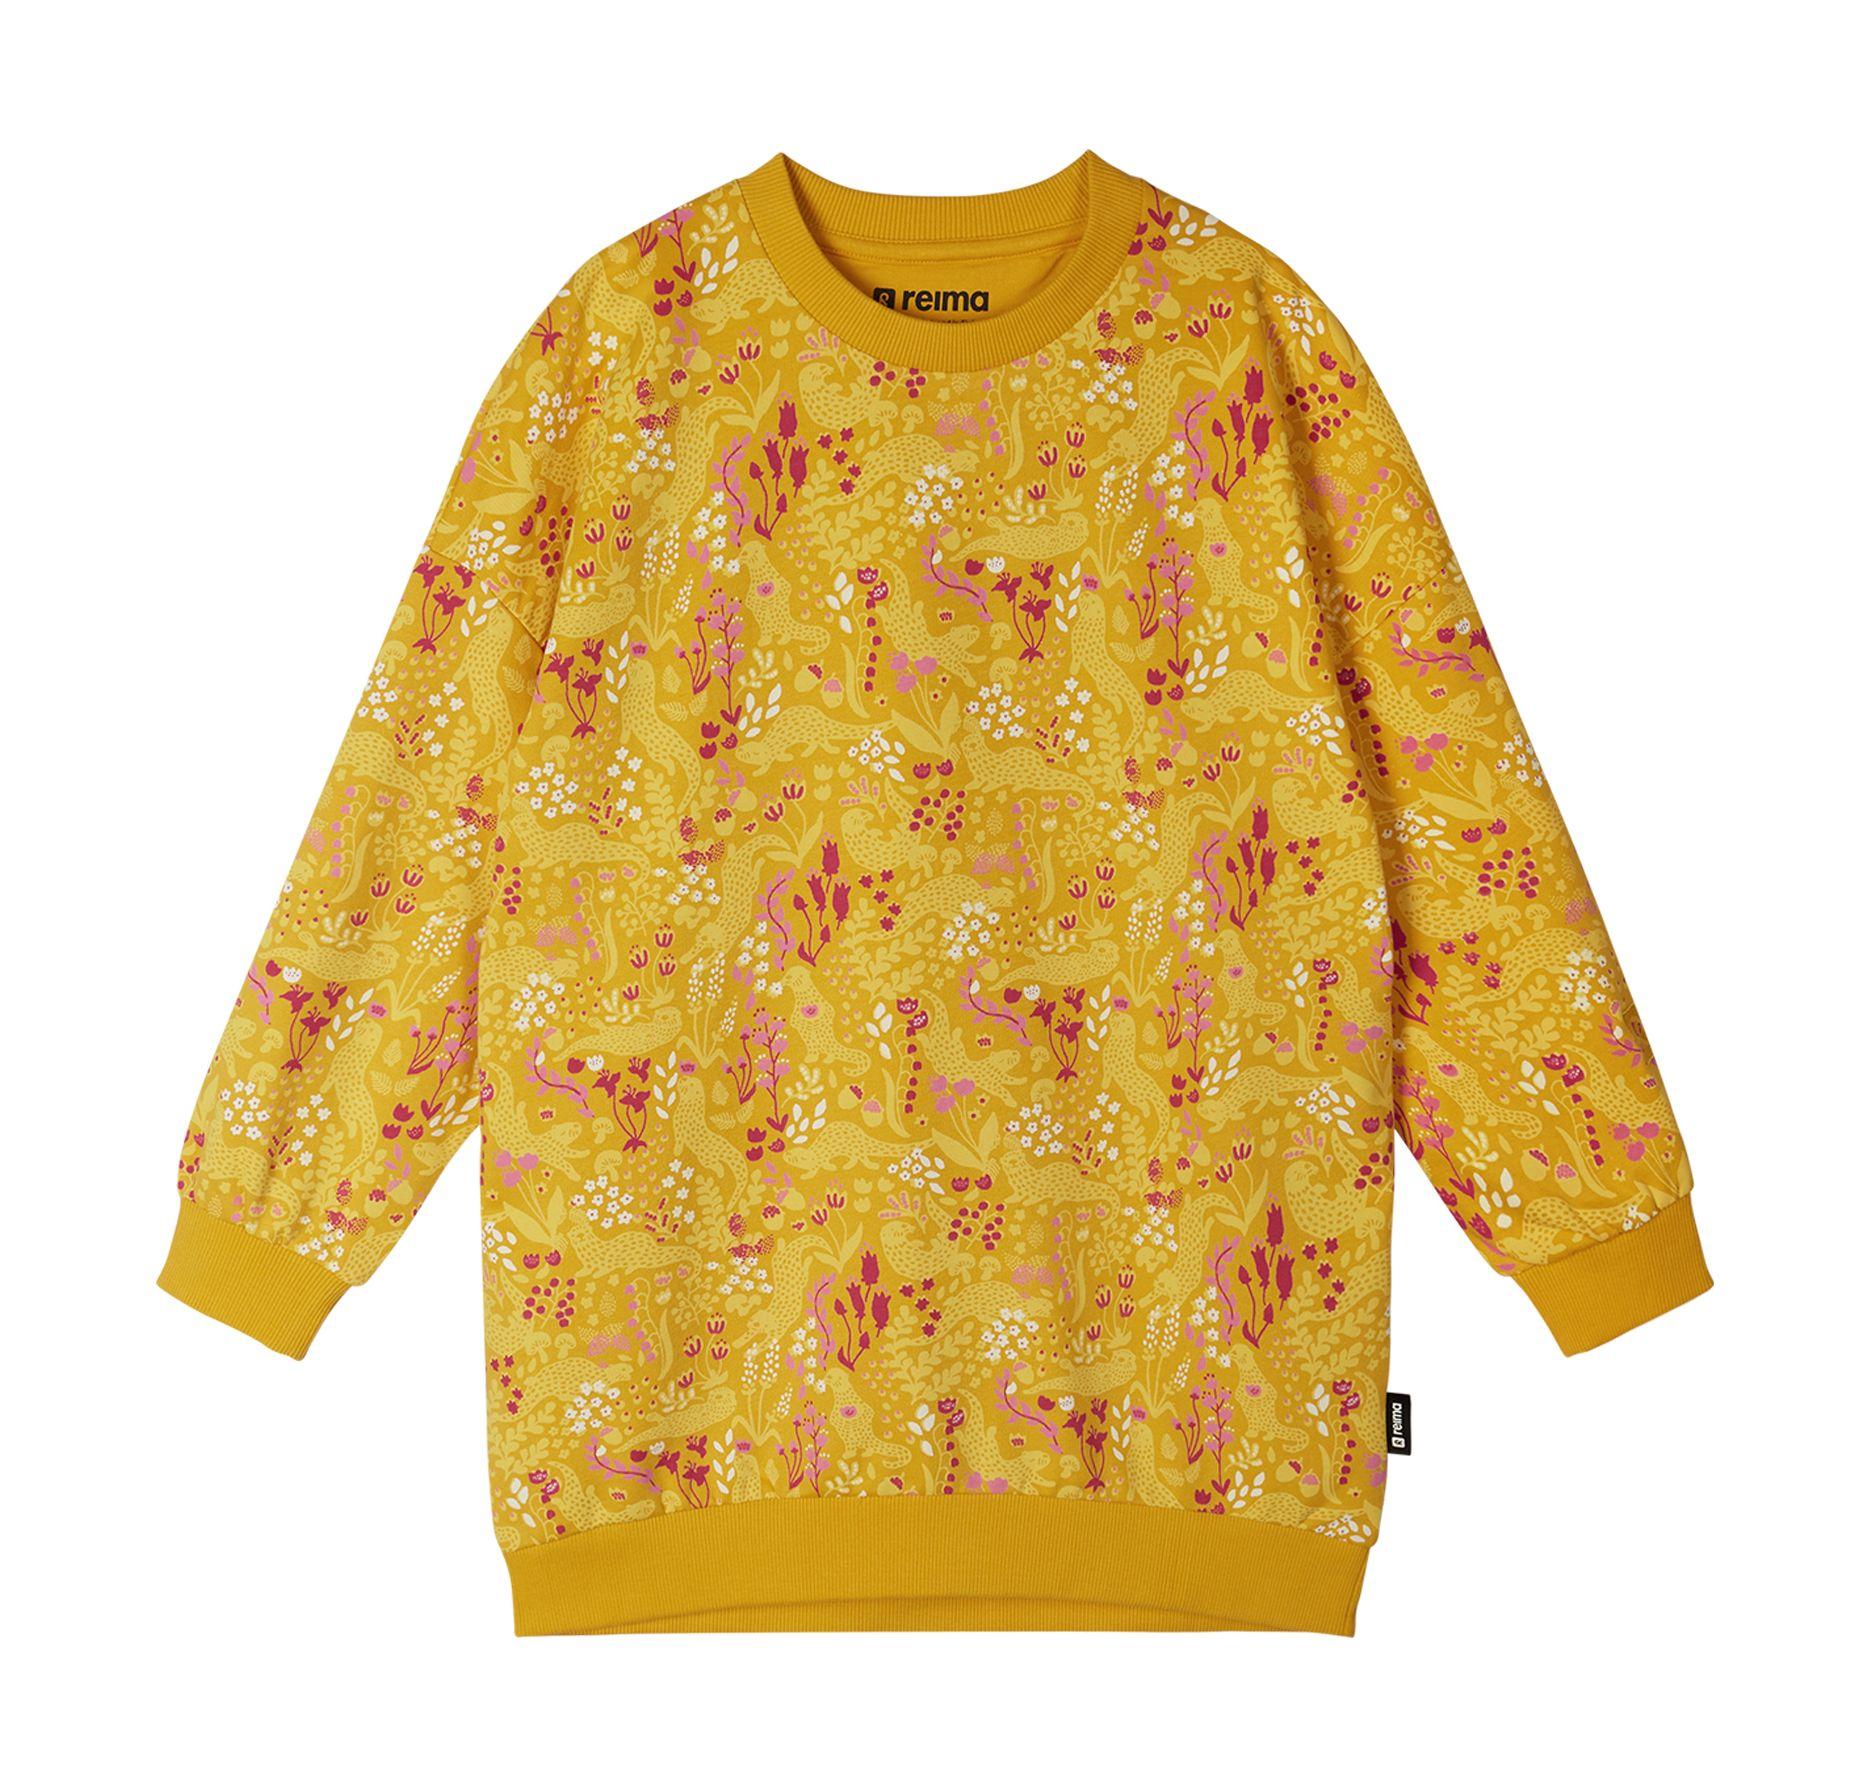 REIMA Saukkosatu Warm Yellow 110-116